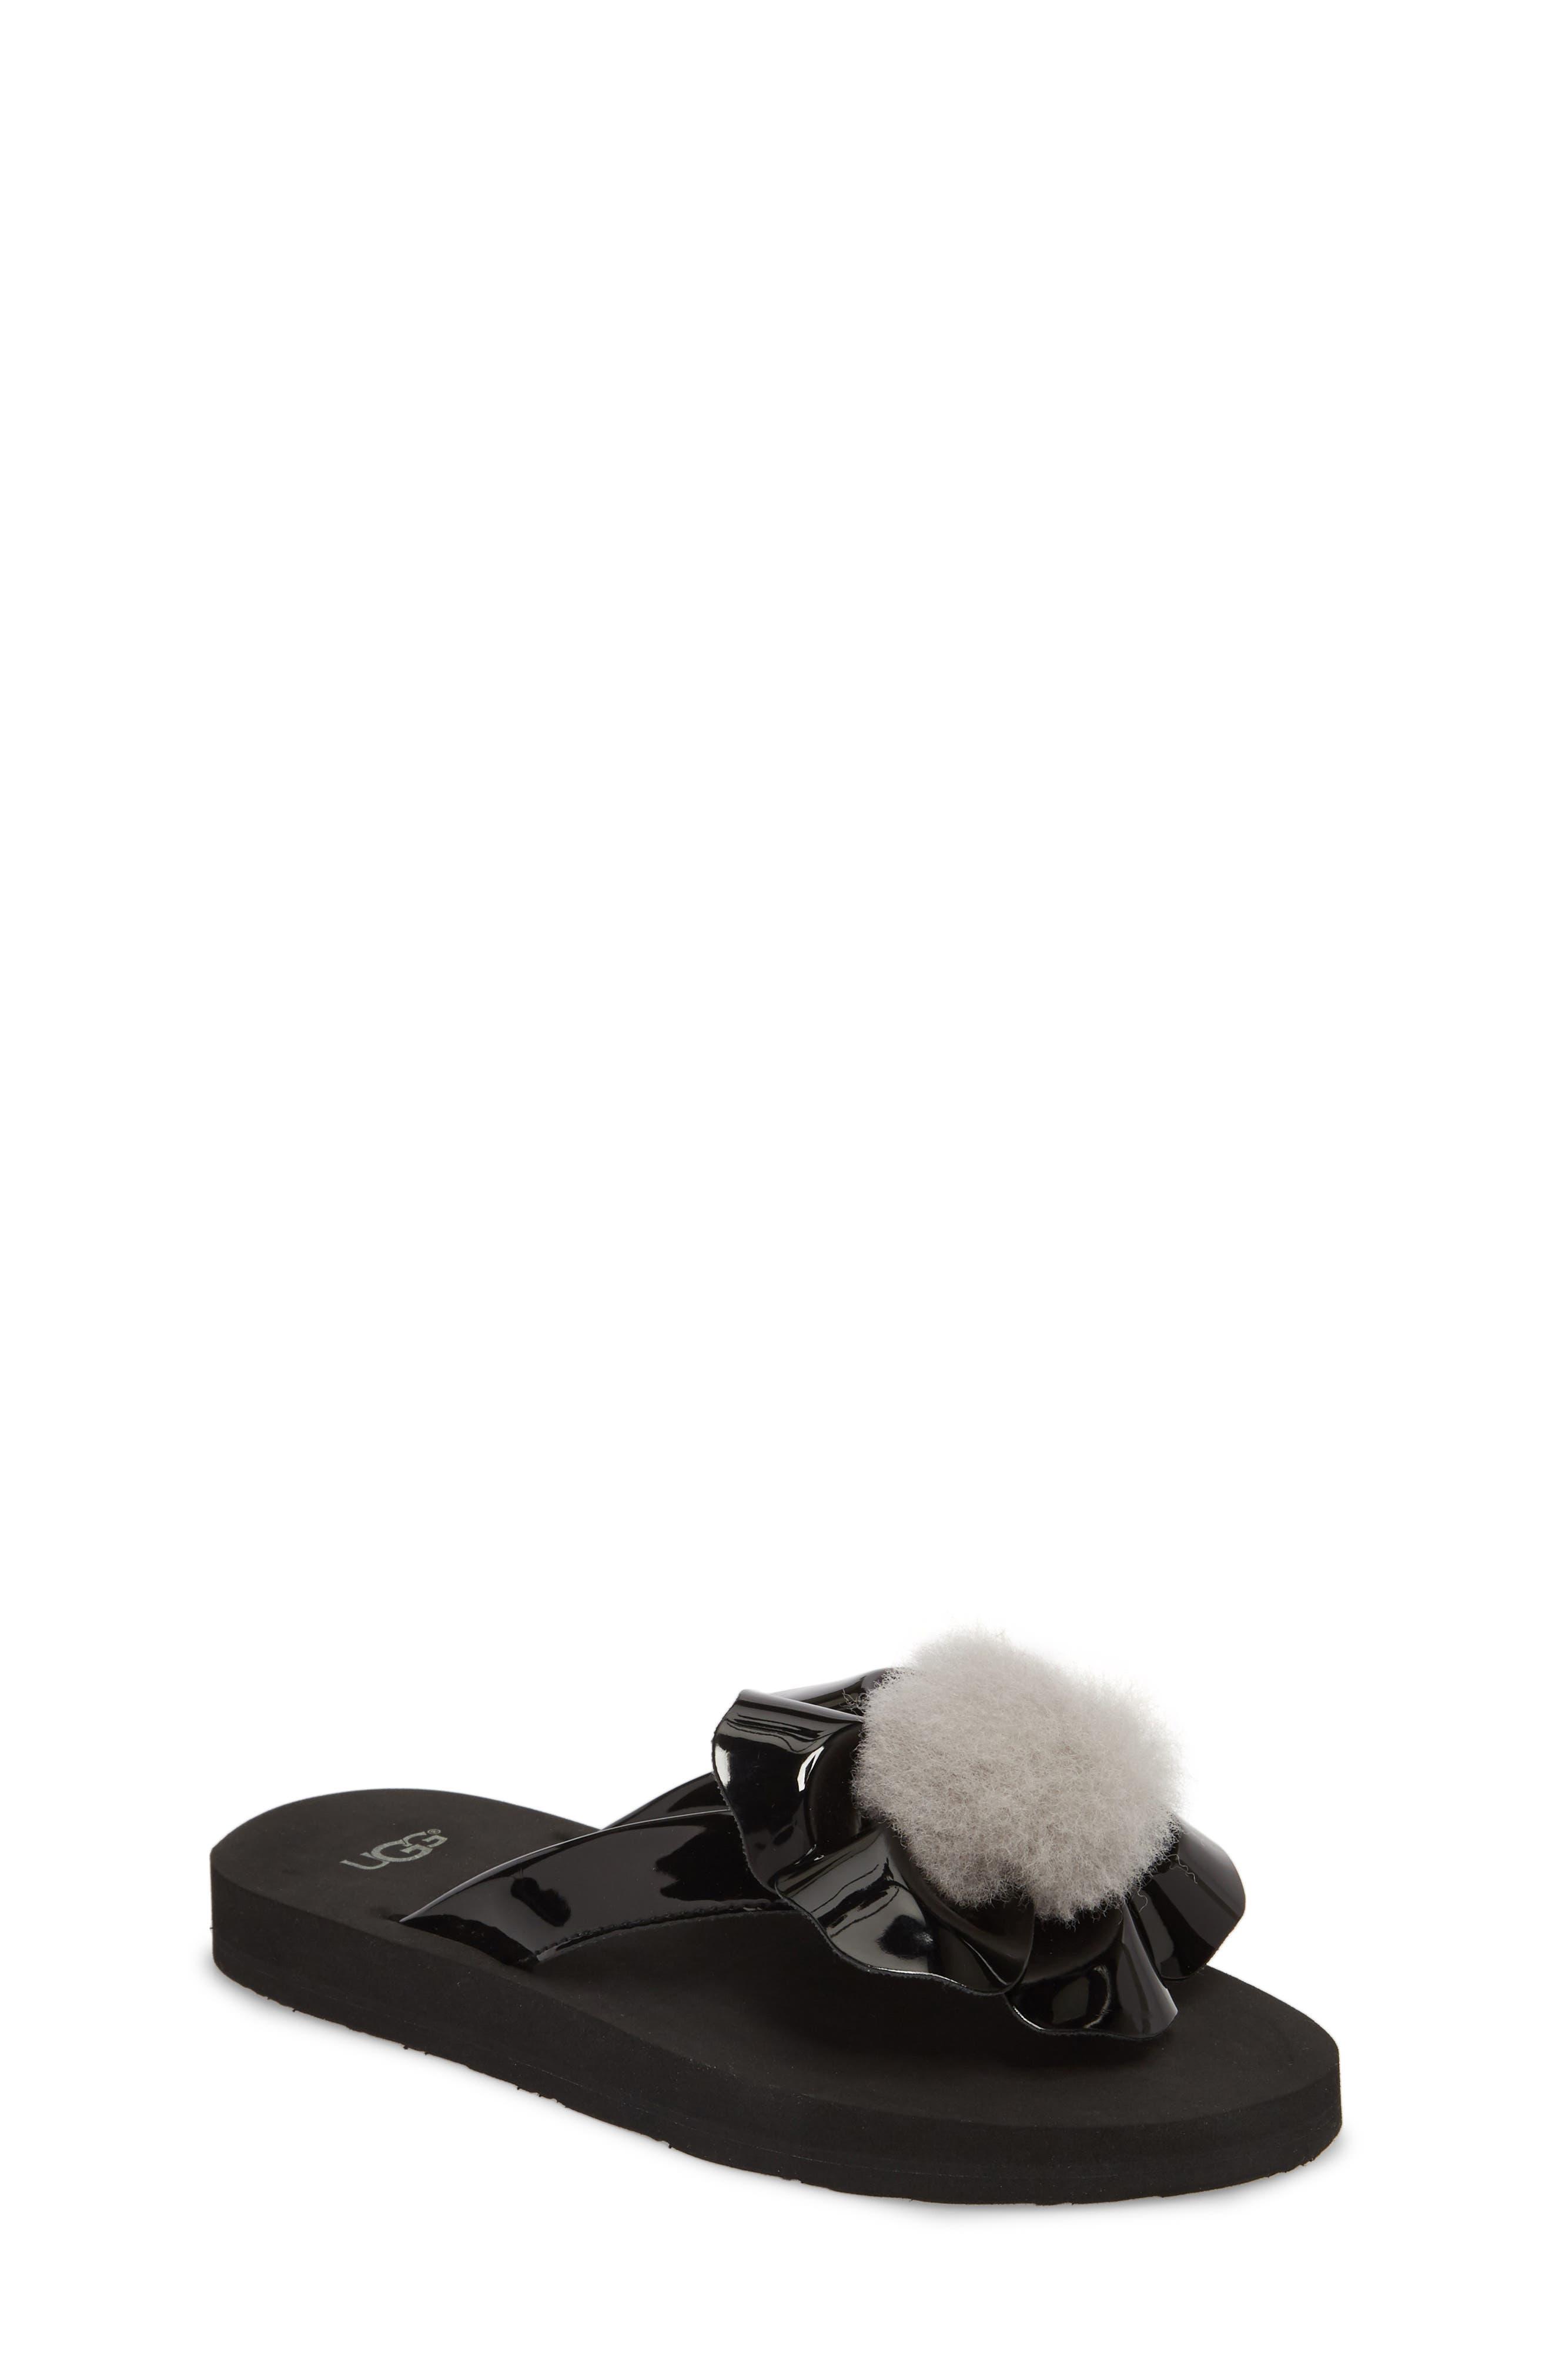 Poppy Genuine Shearling Flip Flop,                             Main thumbnail 1, color,                             Black